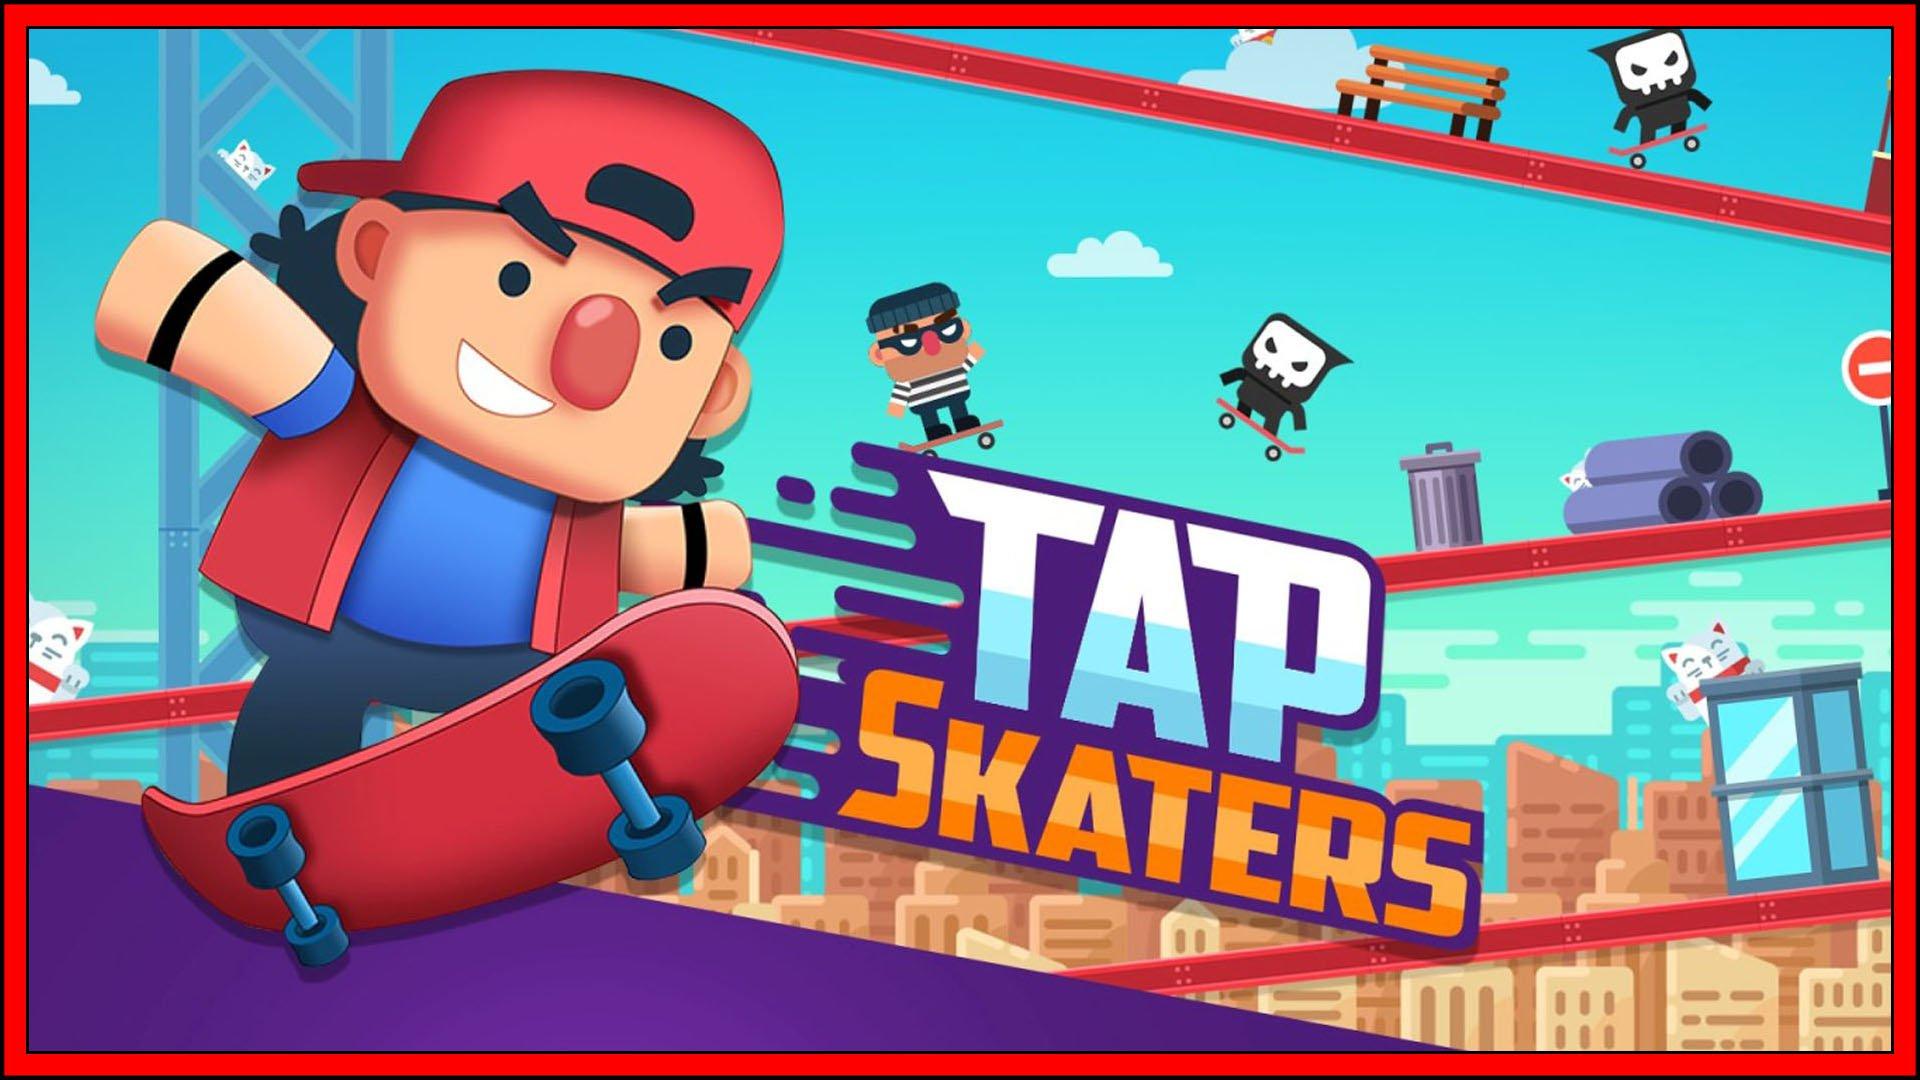 Tap Skaters Fi3